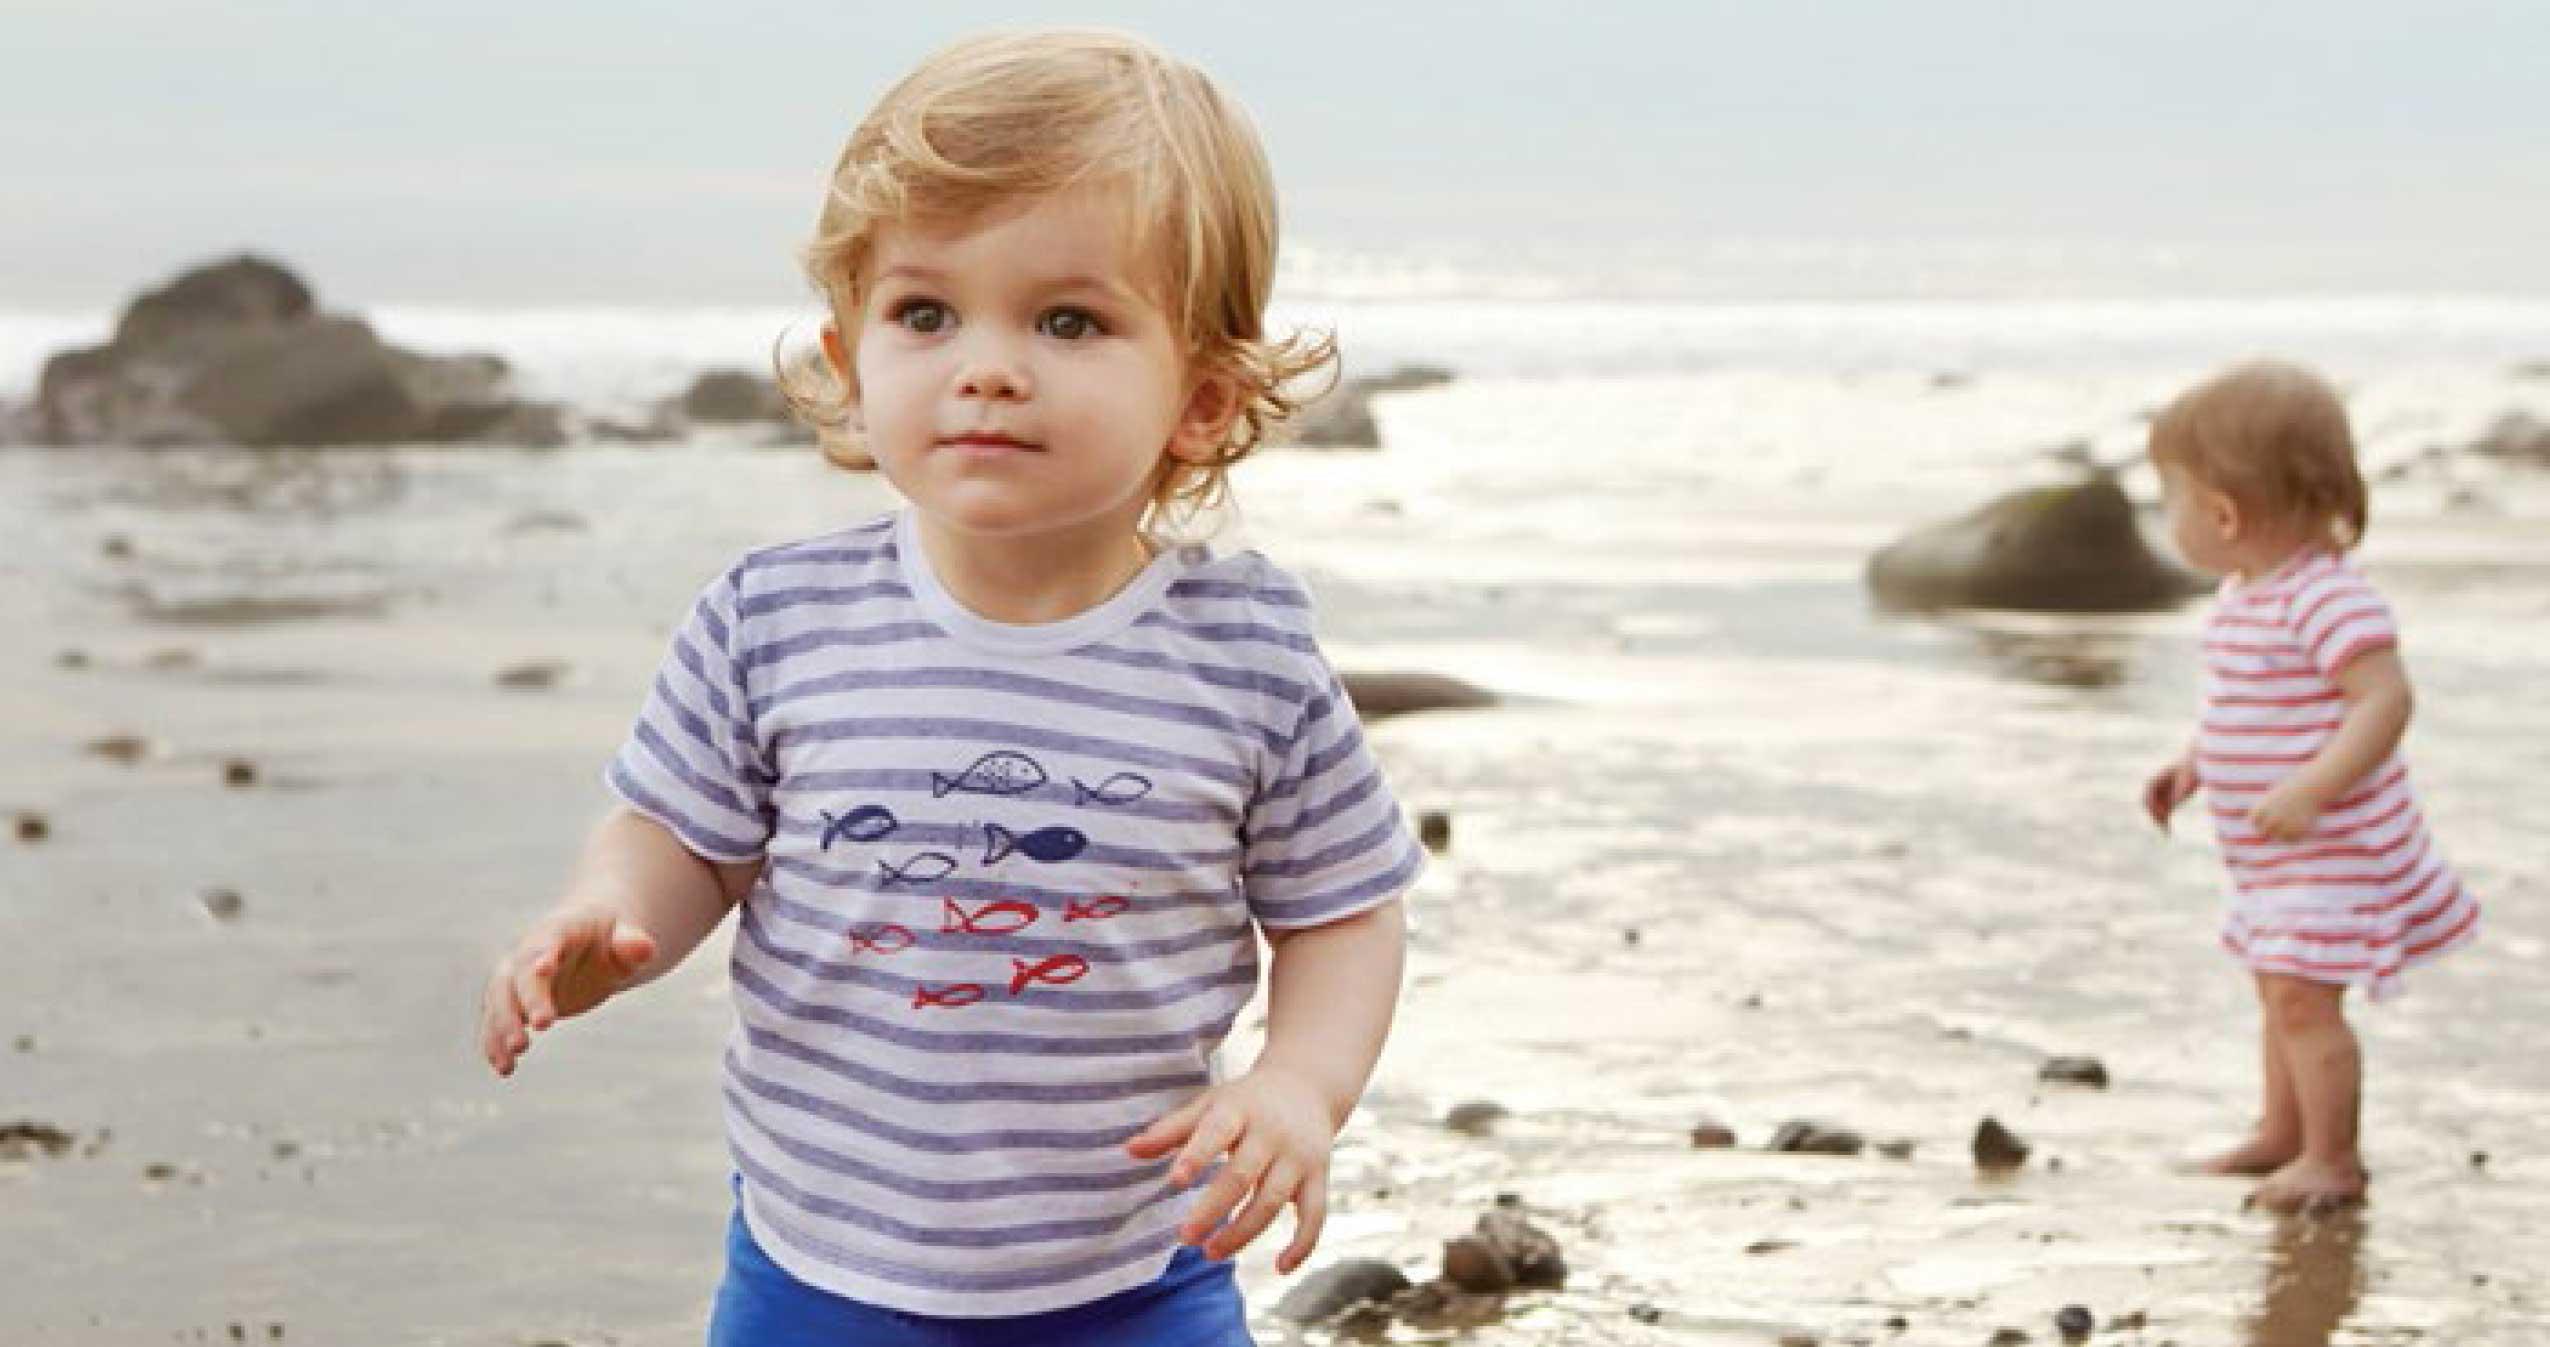 Little children at the beach